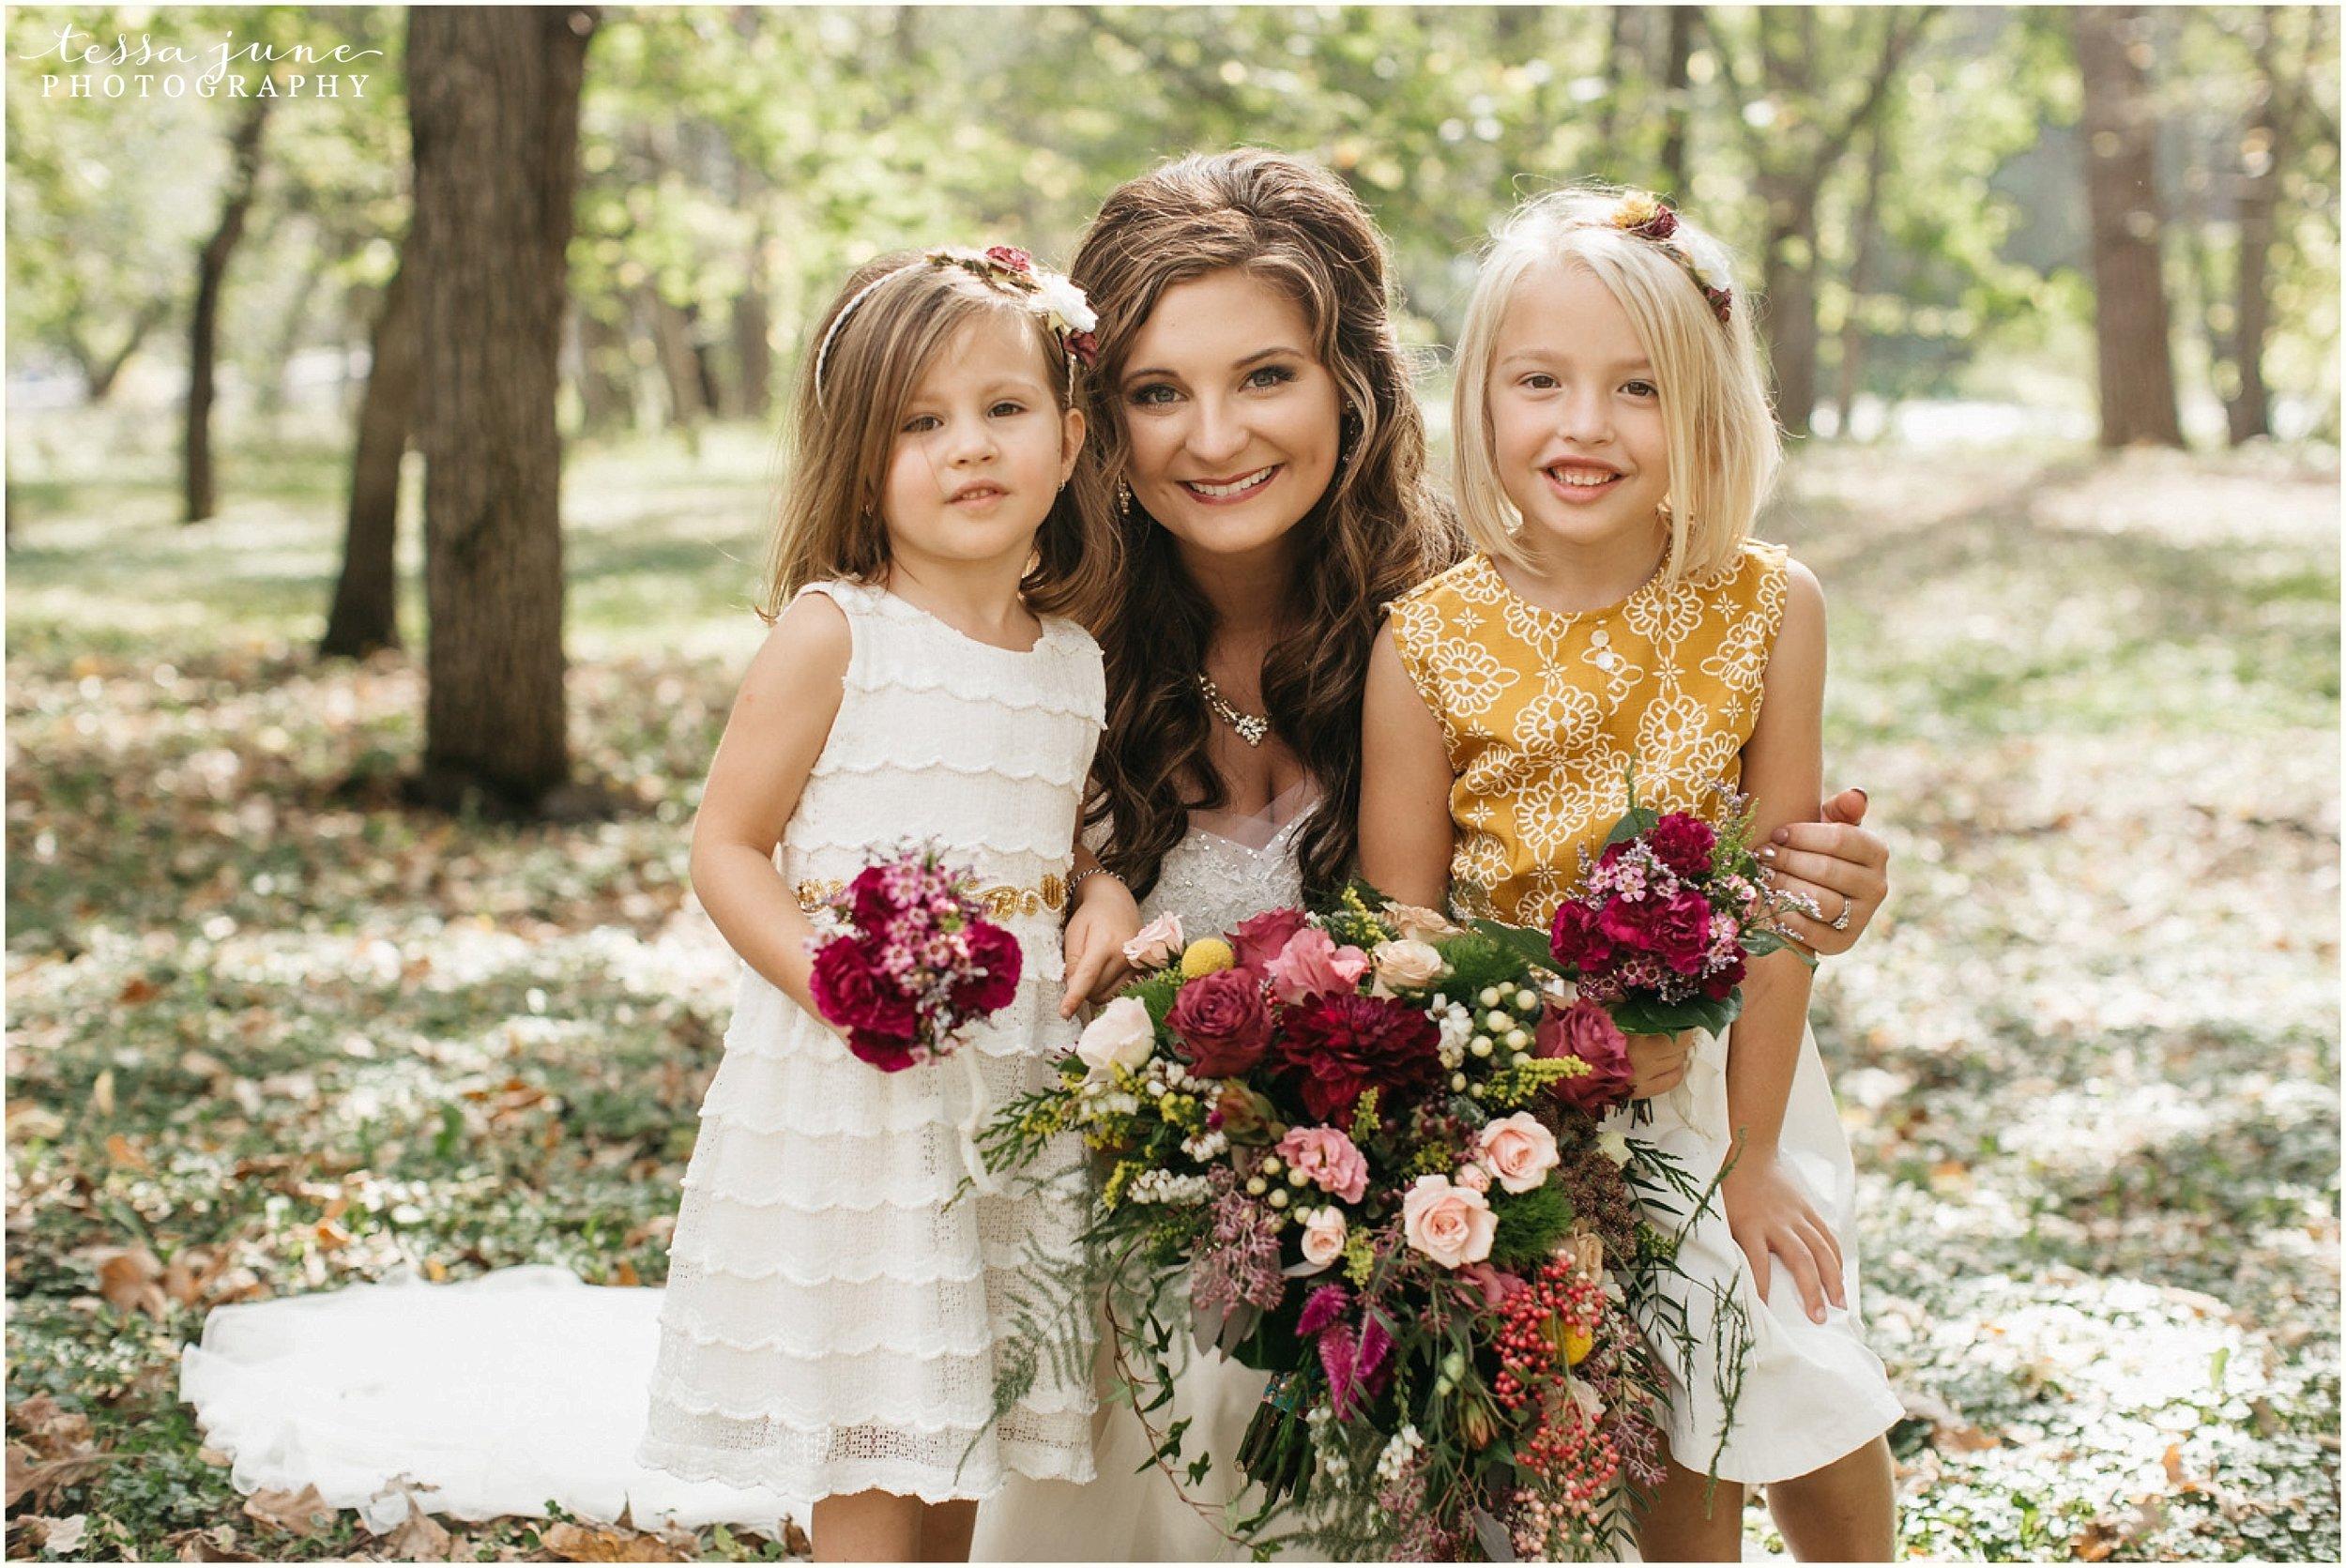 bohemian-minnesota-wedding-mismatched-bridesmaid-dresses-waterfall-st-cloud-tessa-june-photography-86.jpg